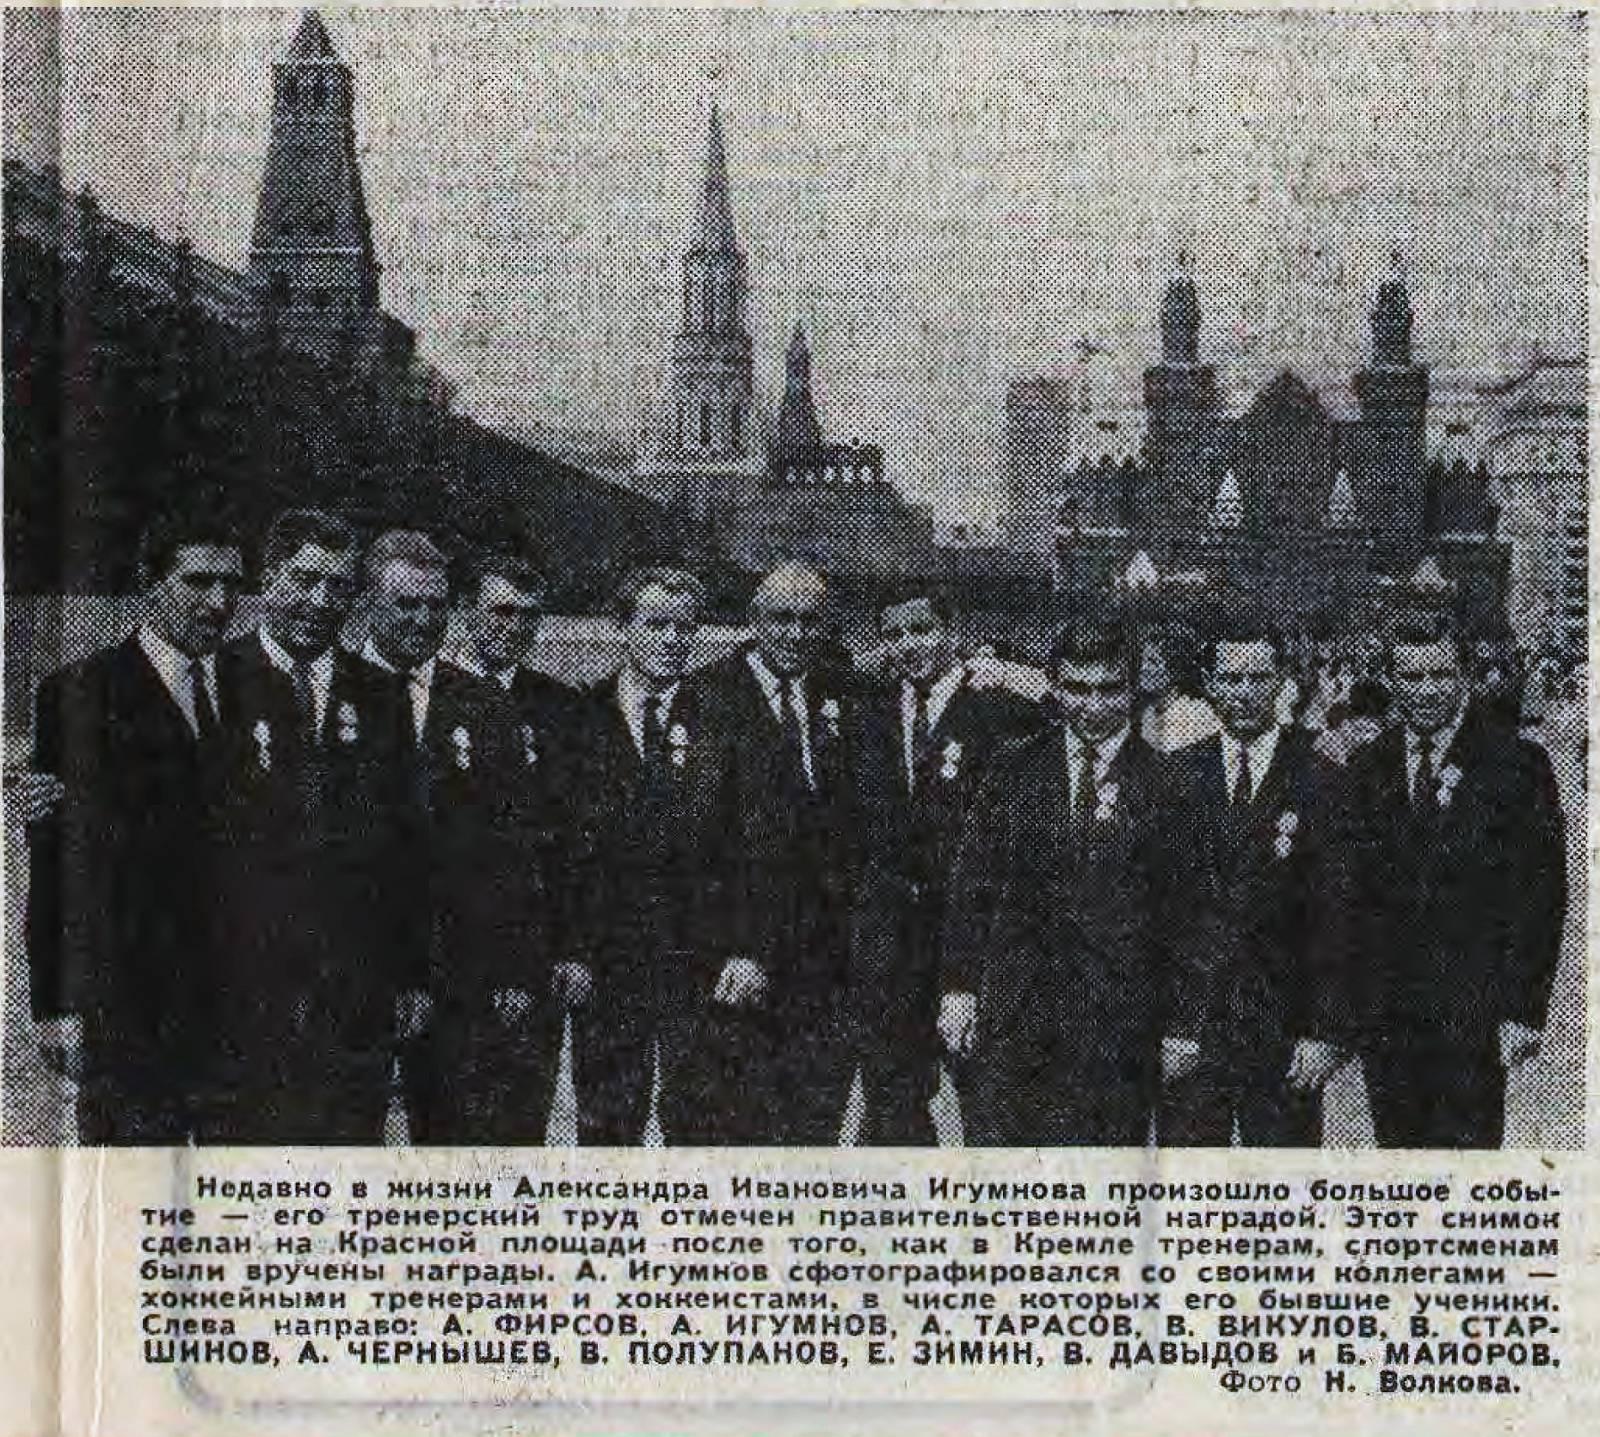 Севидов, александр владимирович